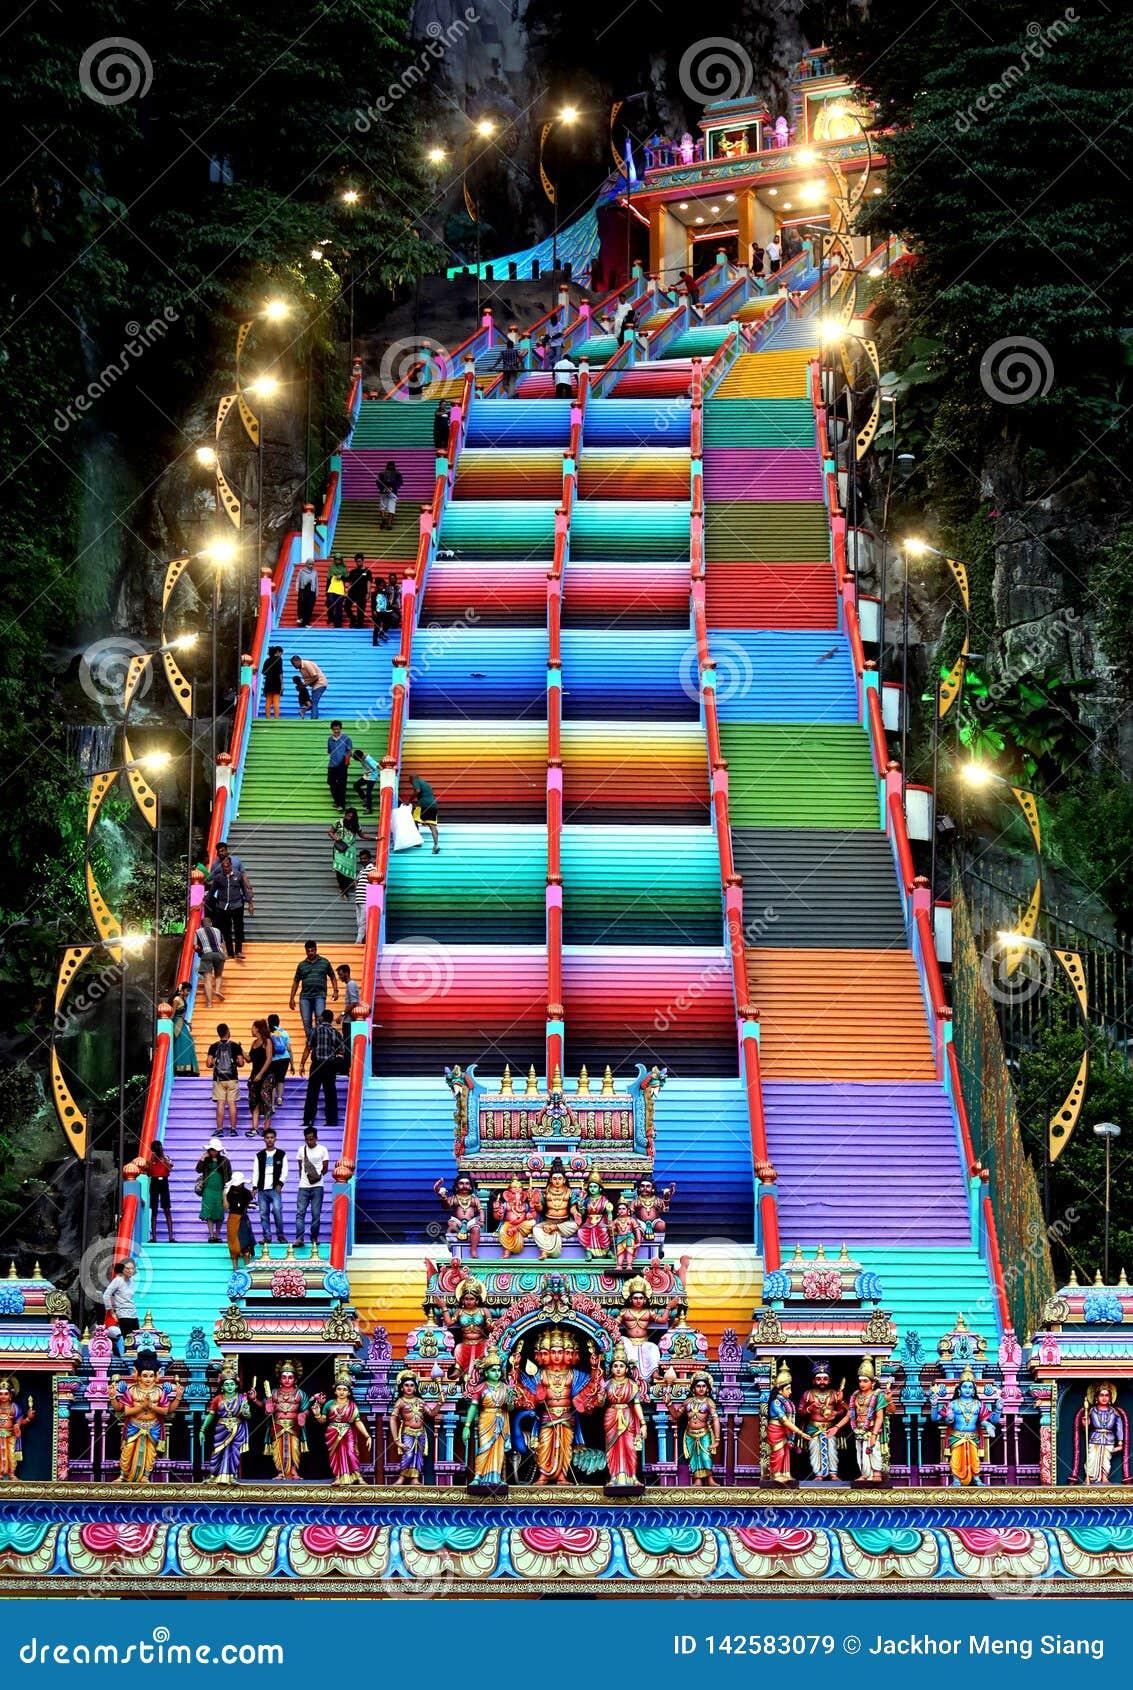 De färgglade momenten på Batu Caces, Mlaysia